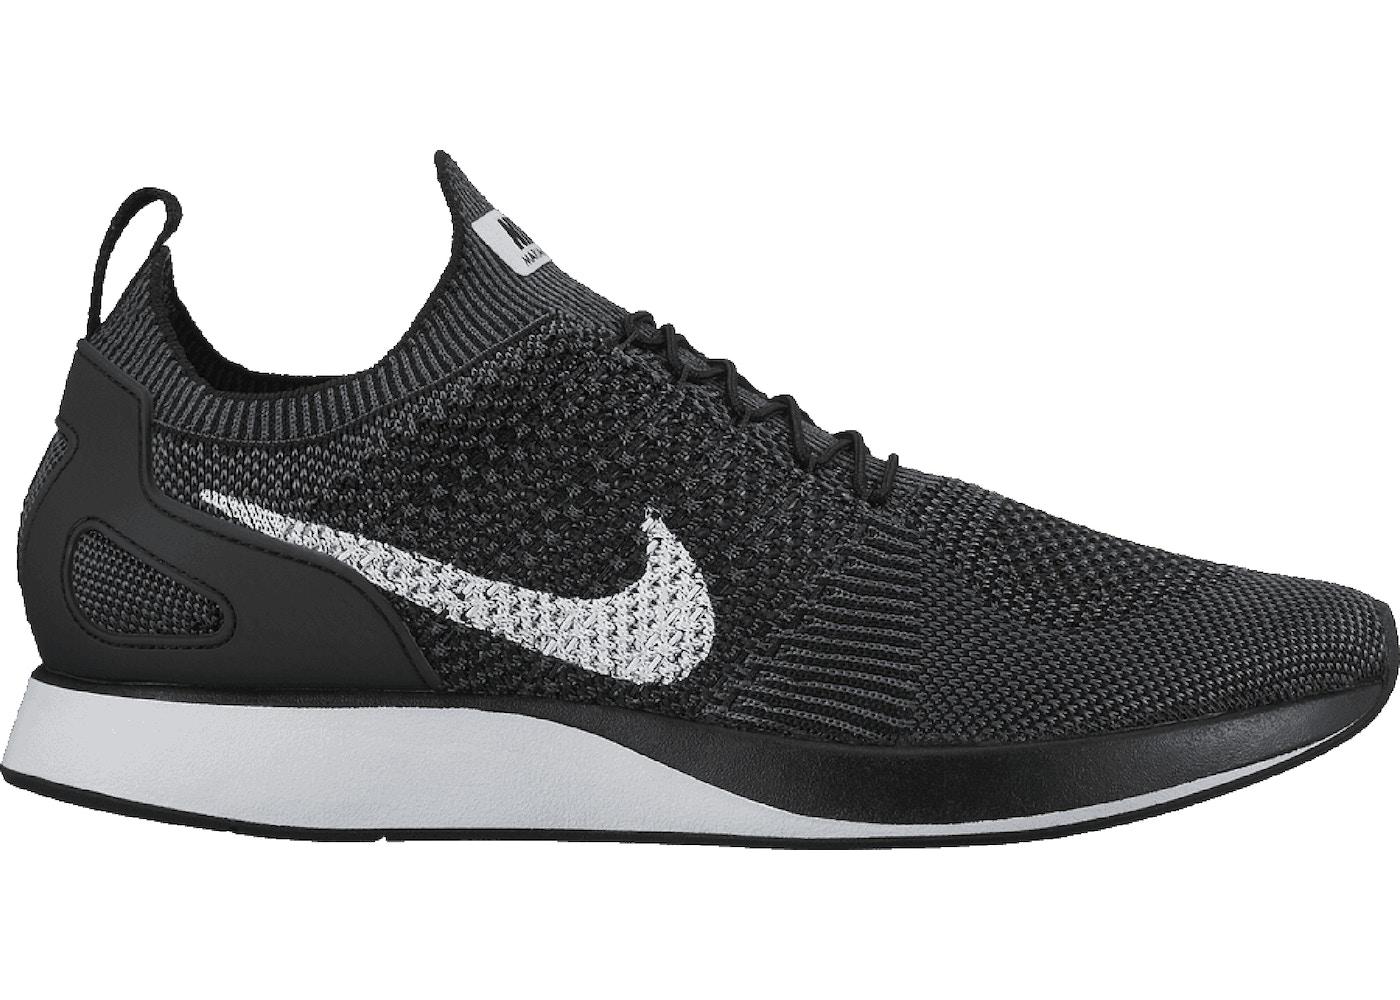 Destilar De Verdad Necesitar  Nike Mariah Flyknit Racer Black White - 918264-001